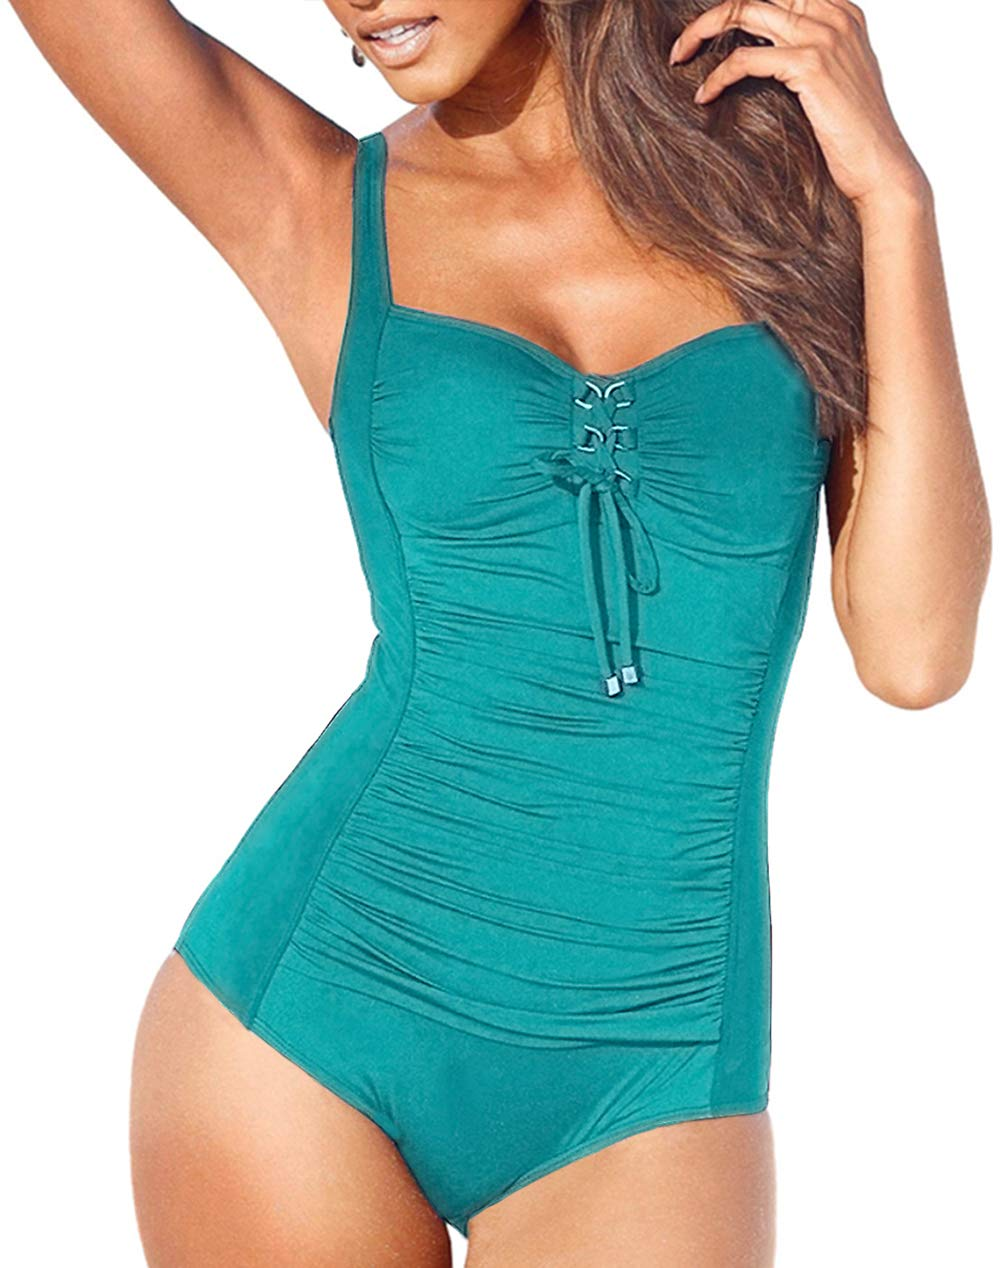 Upopby Women's Vintage Lace up One Piece Swimsuits Monikini Tummy Control Swimwear Green 16